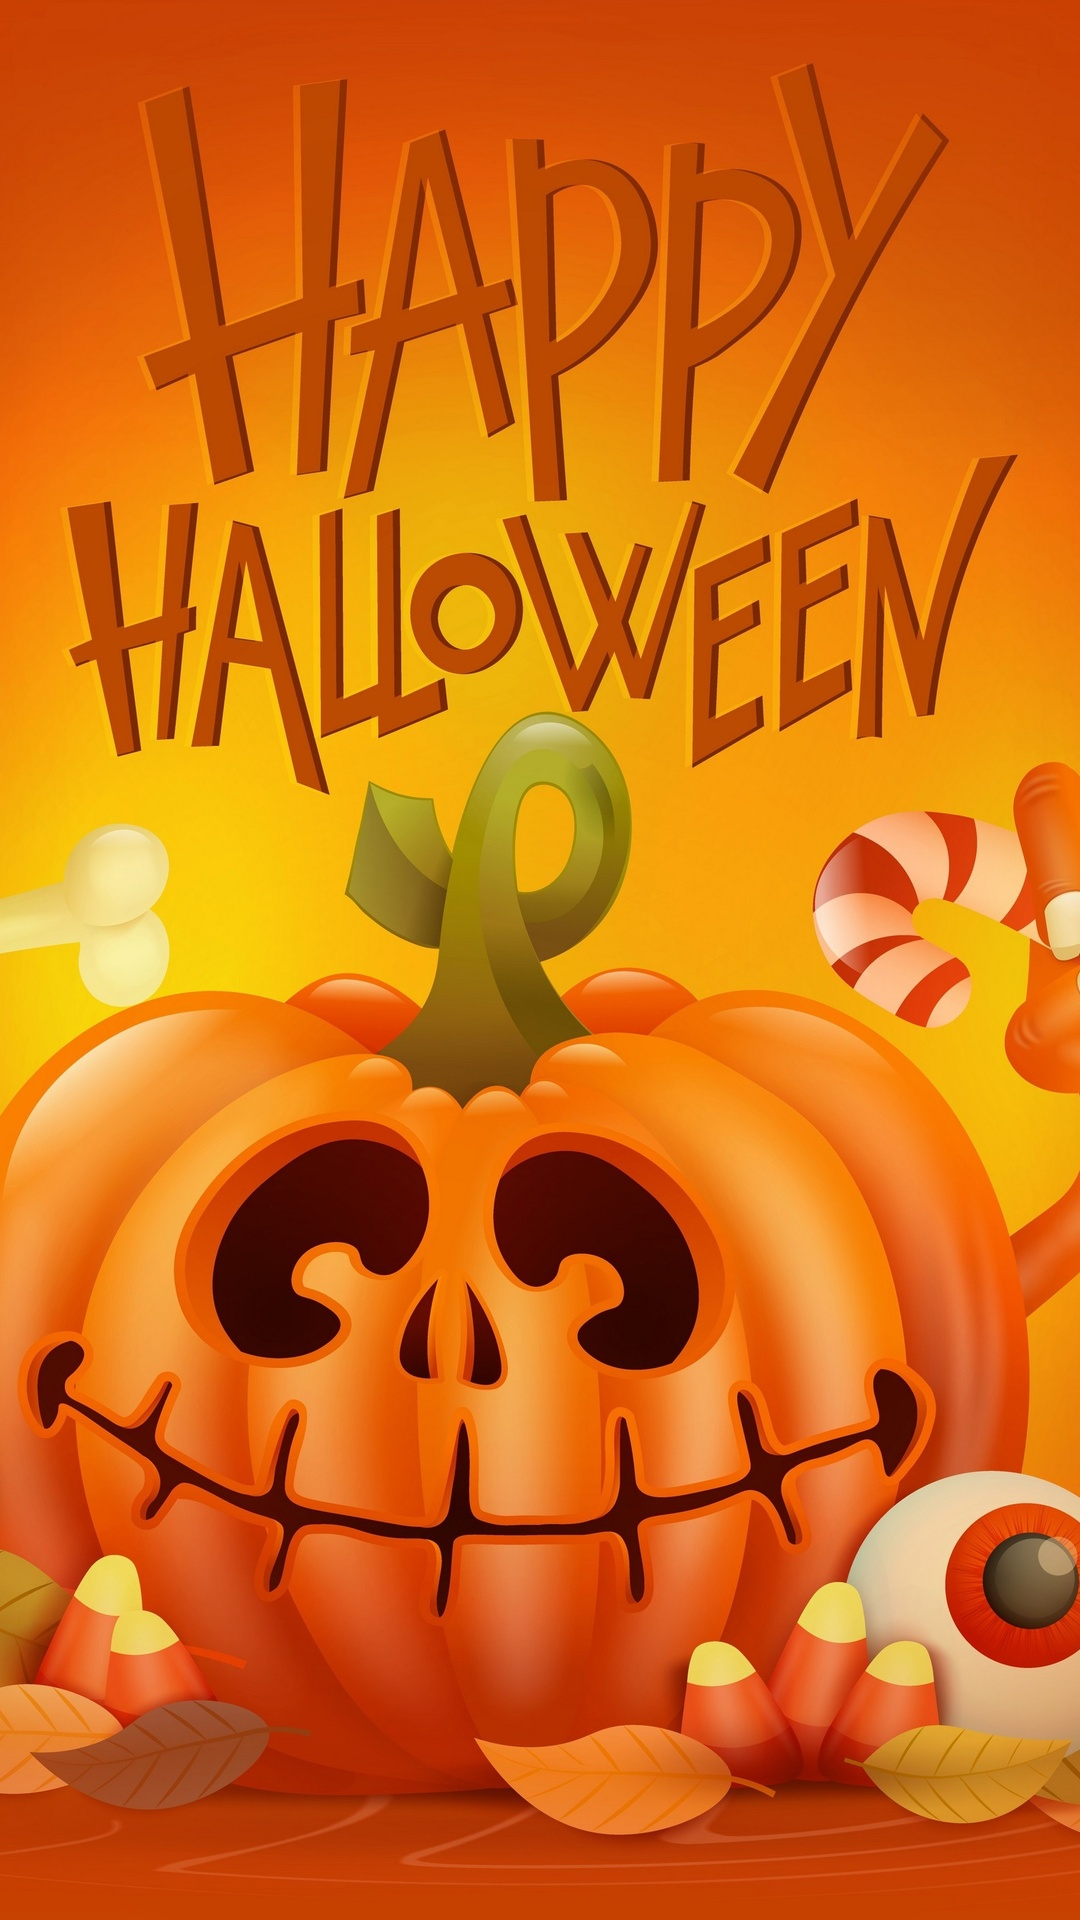 1080x1920 Happy Halloween 4k Iphone 7 6s 6 Plus Pixel Xl One